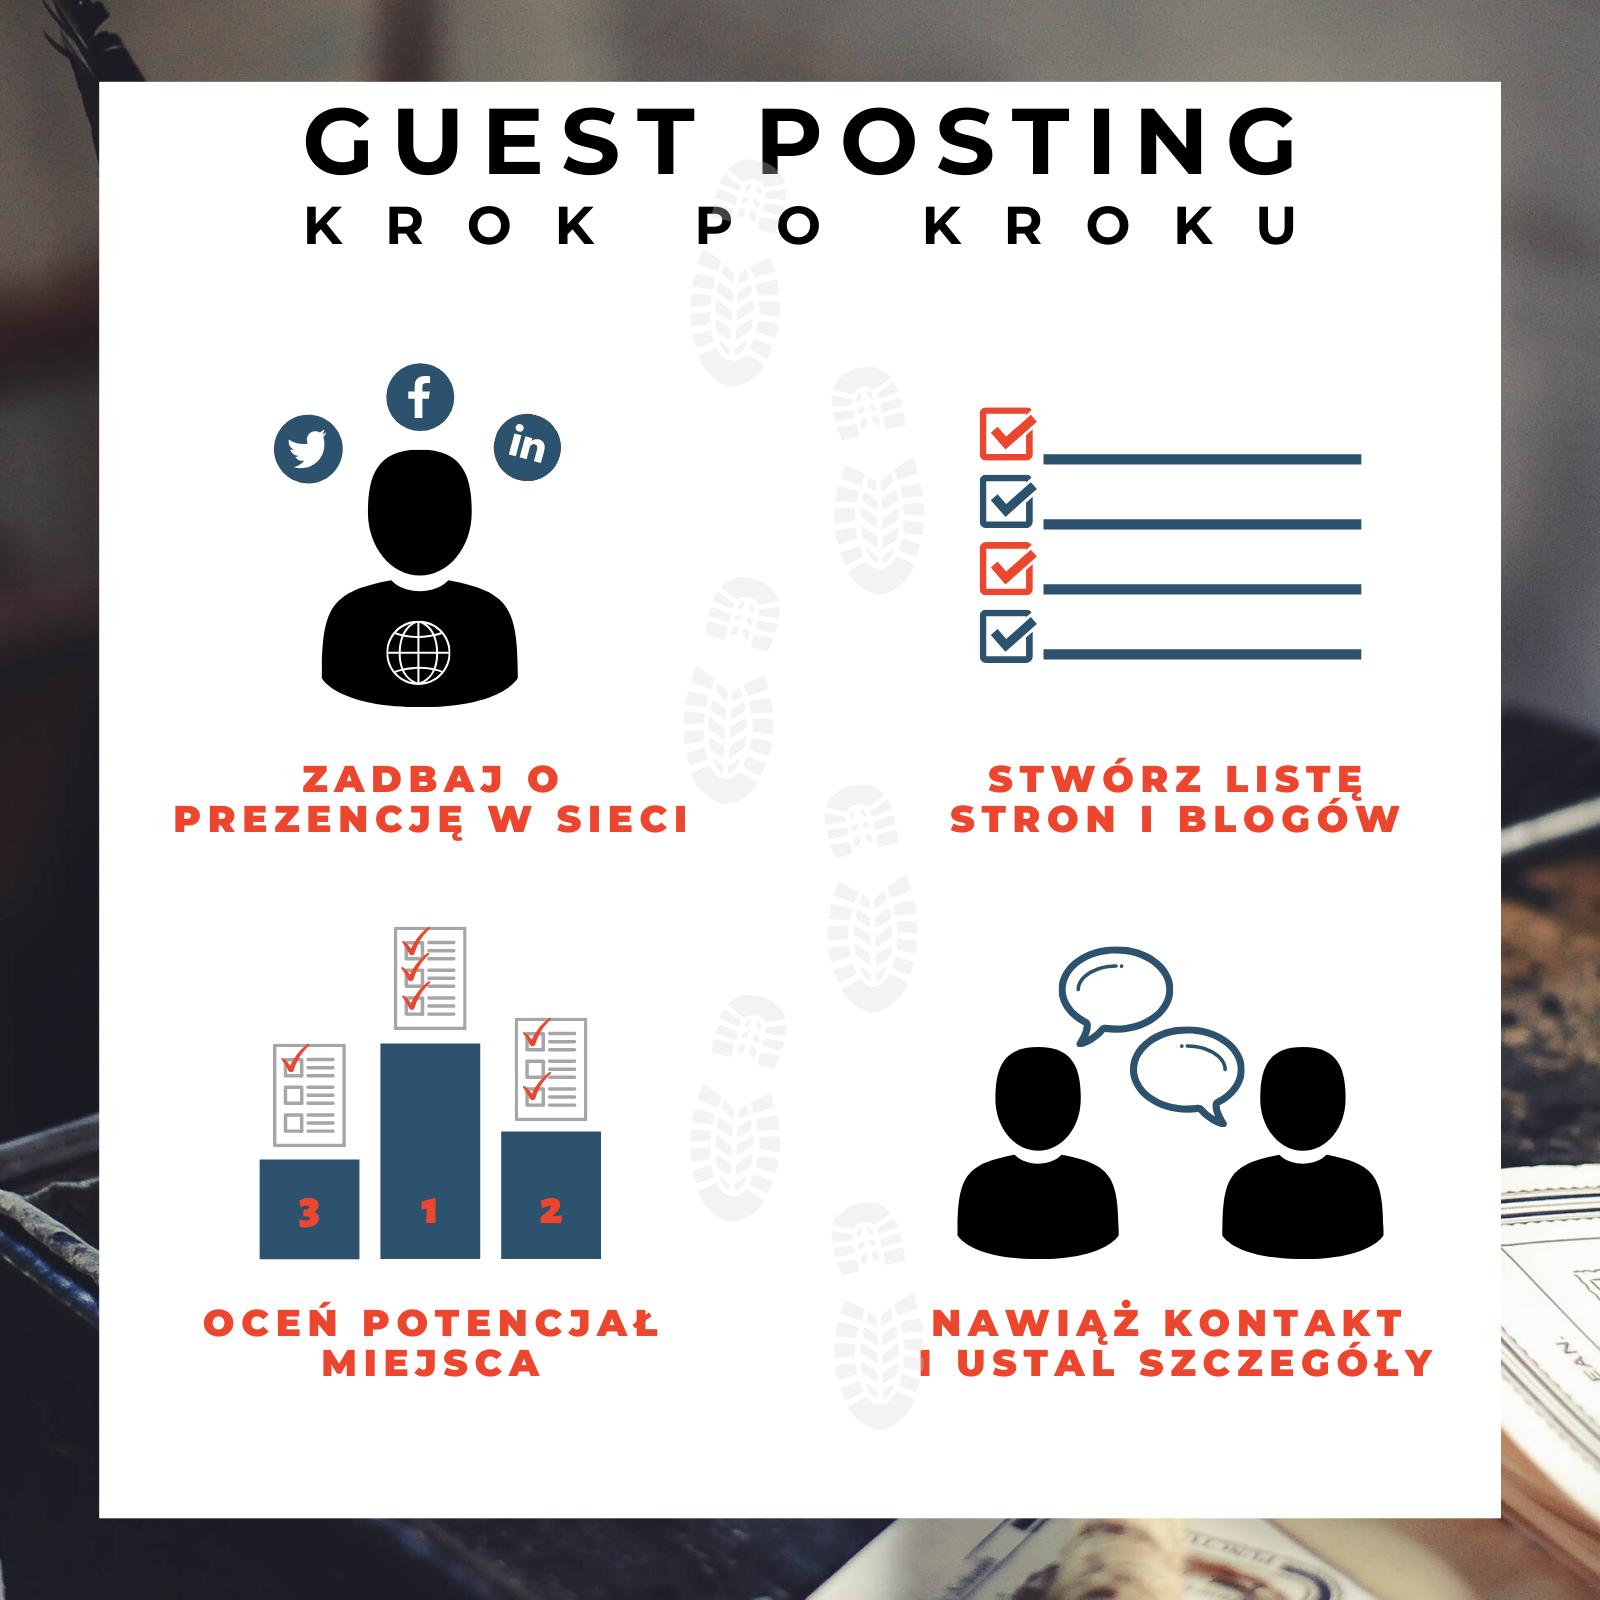 Guest posting - Krok po kroku - Infografika